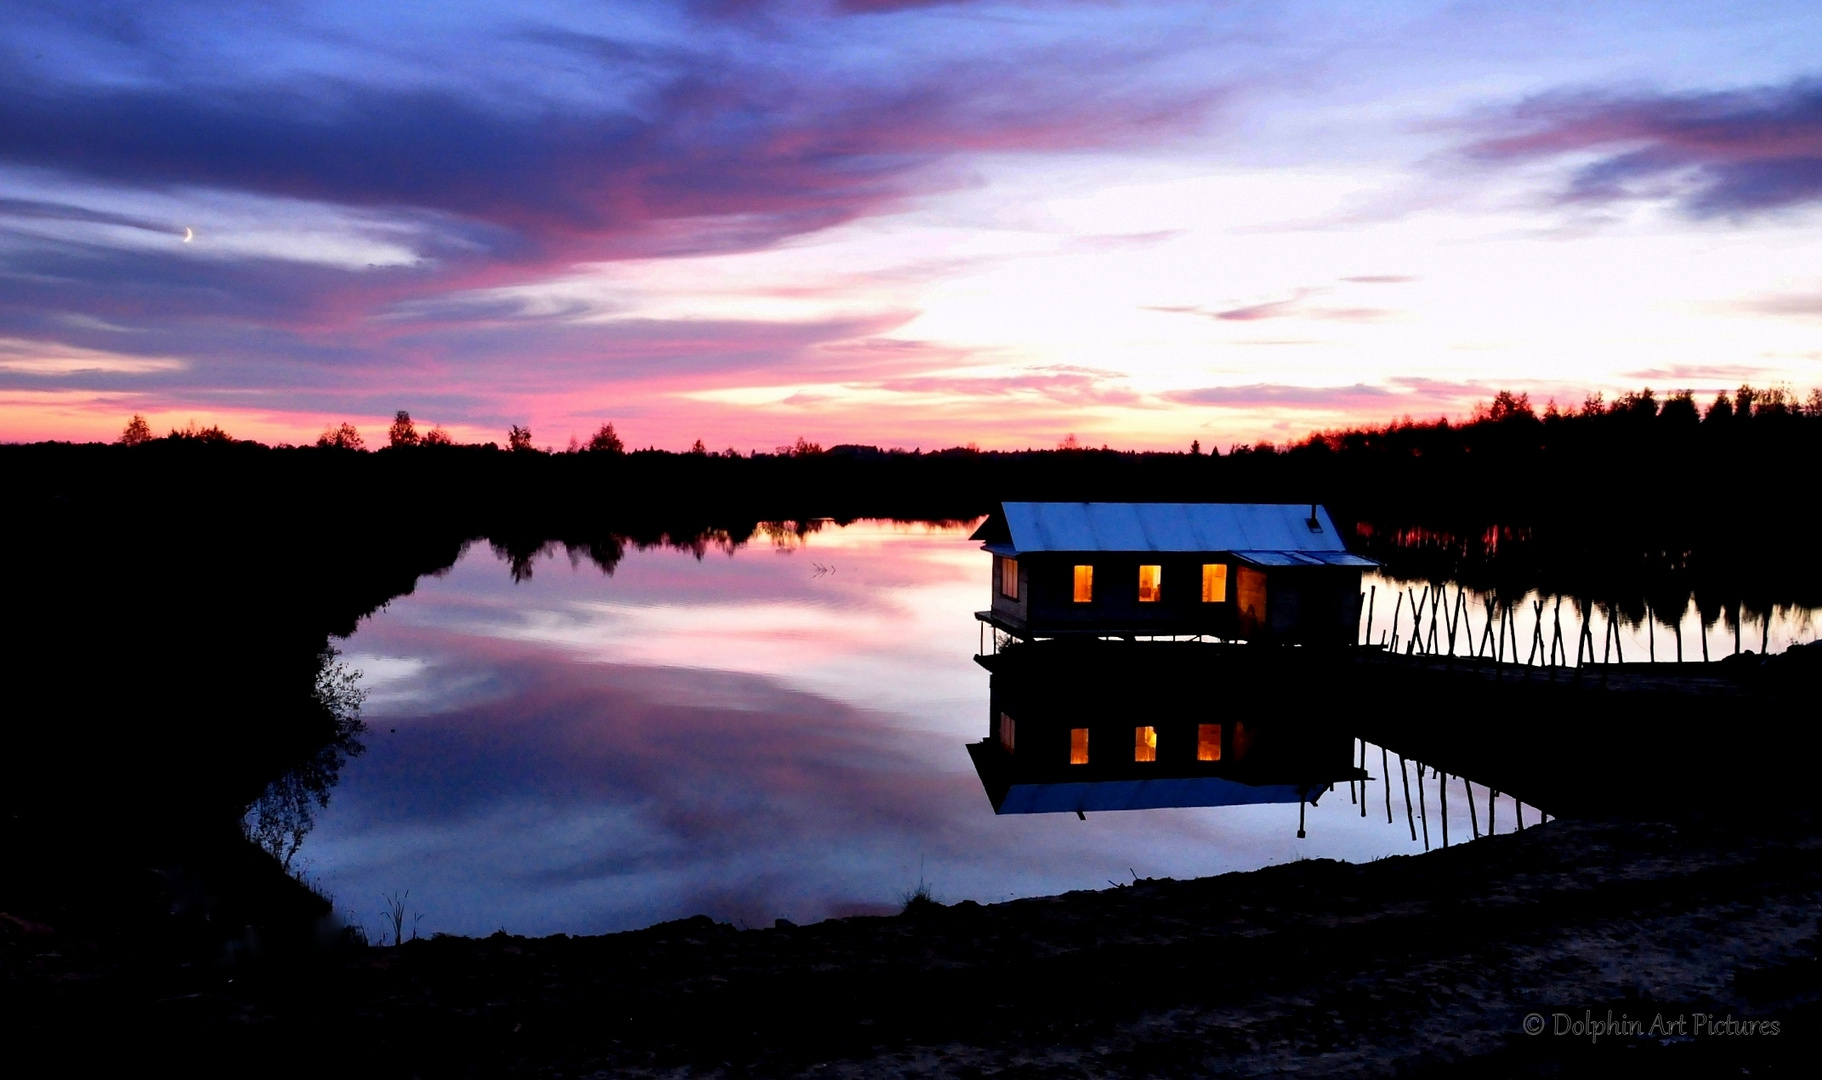 Autumn sunset above the fish pond